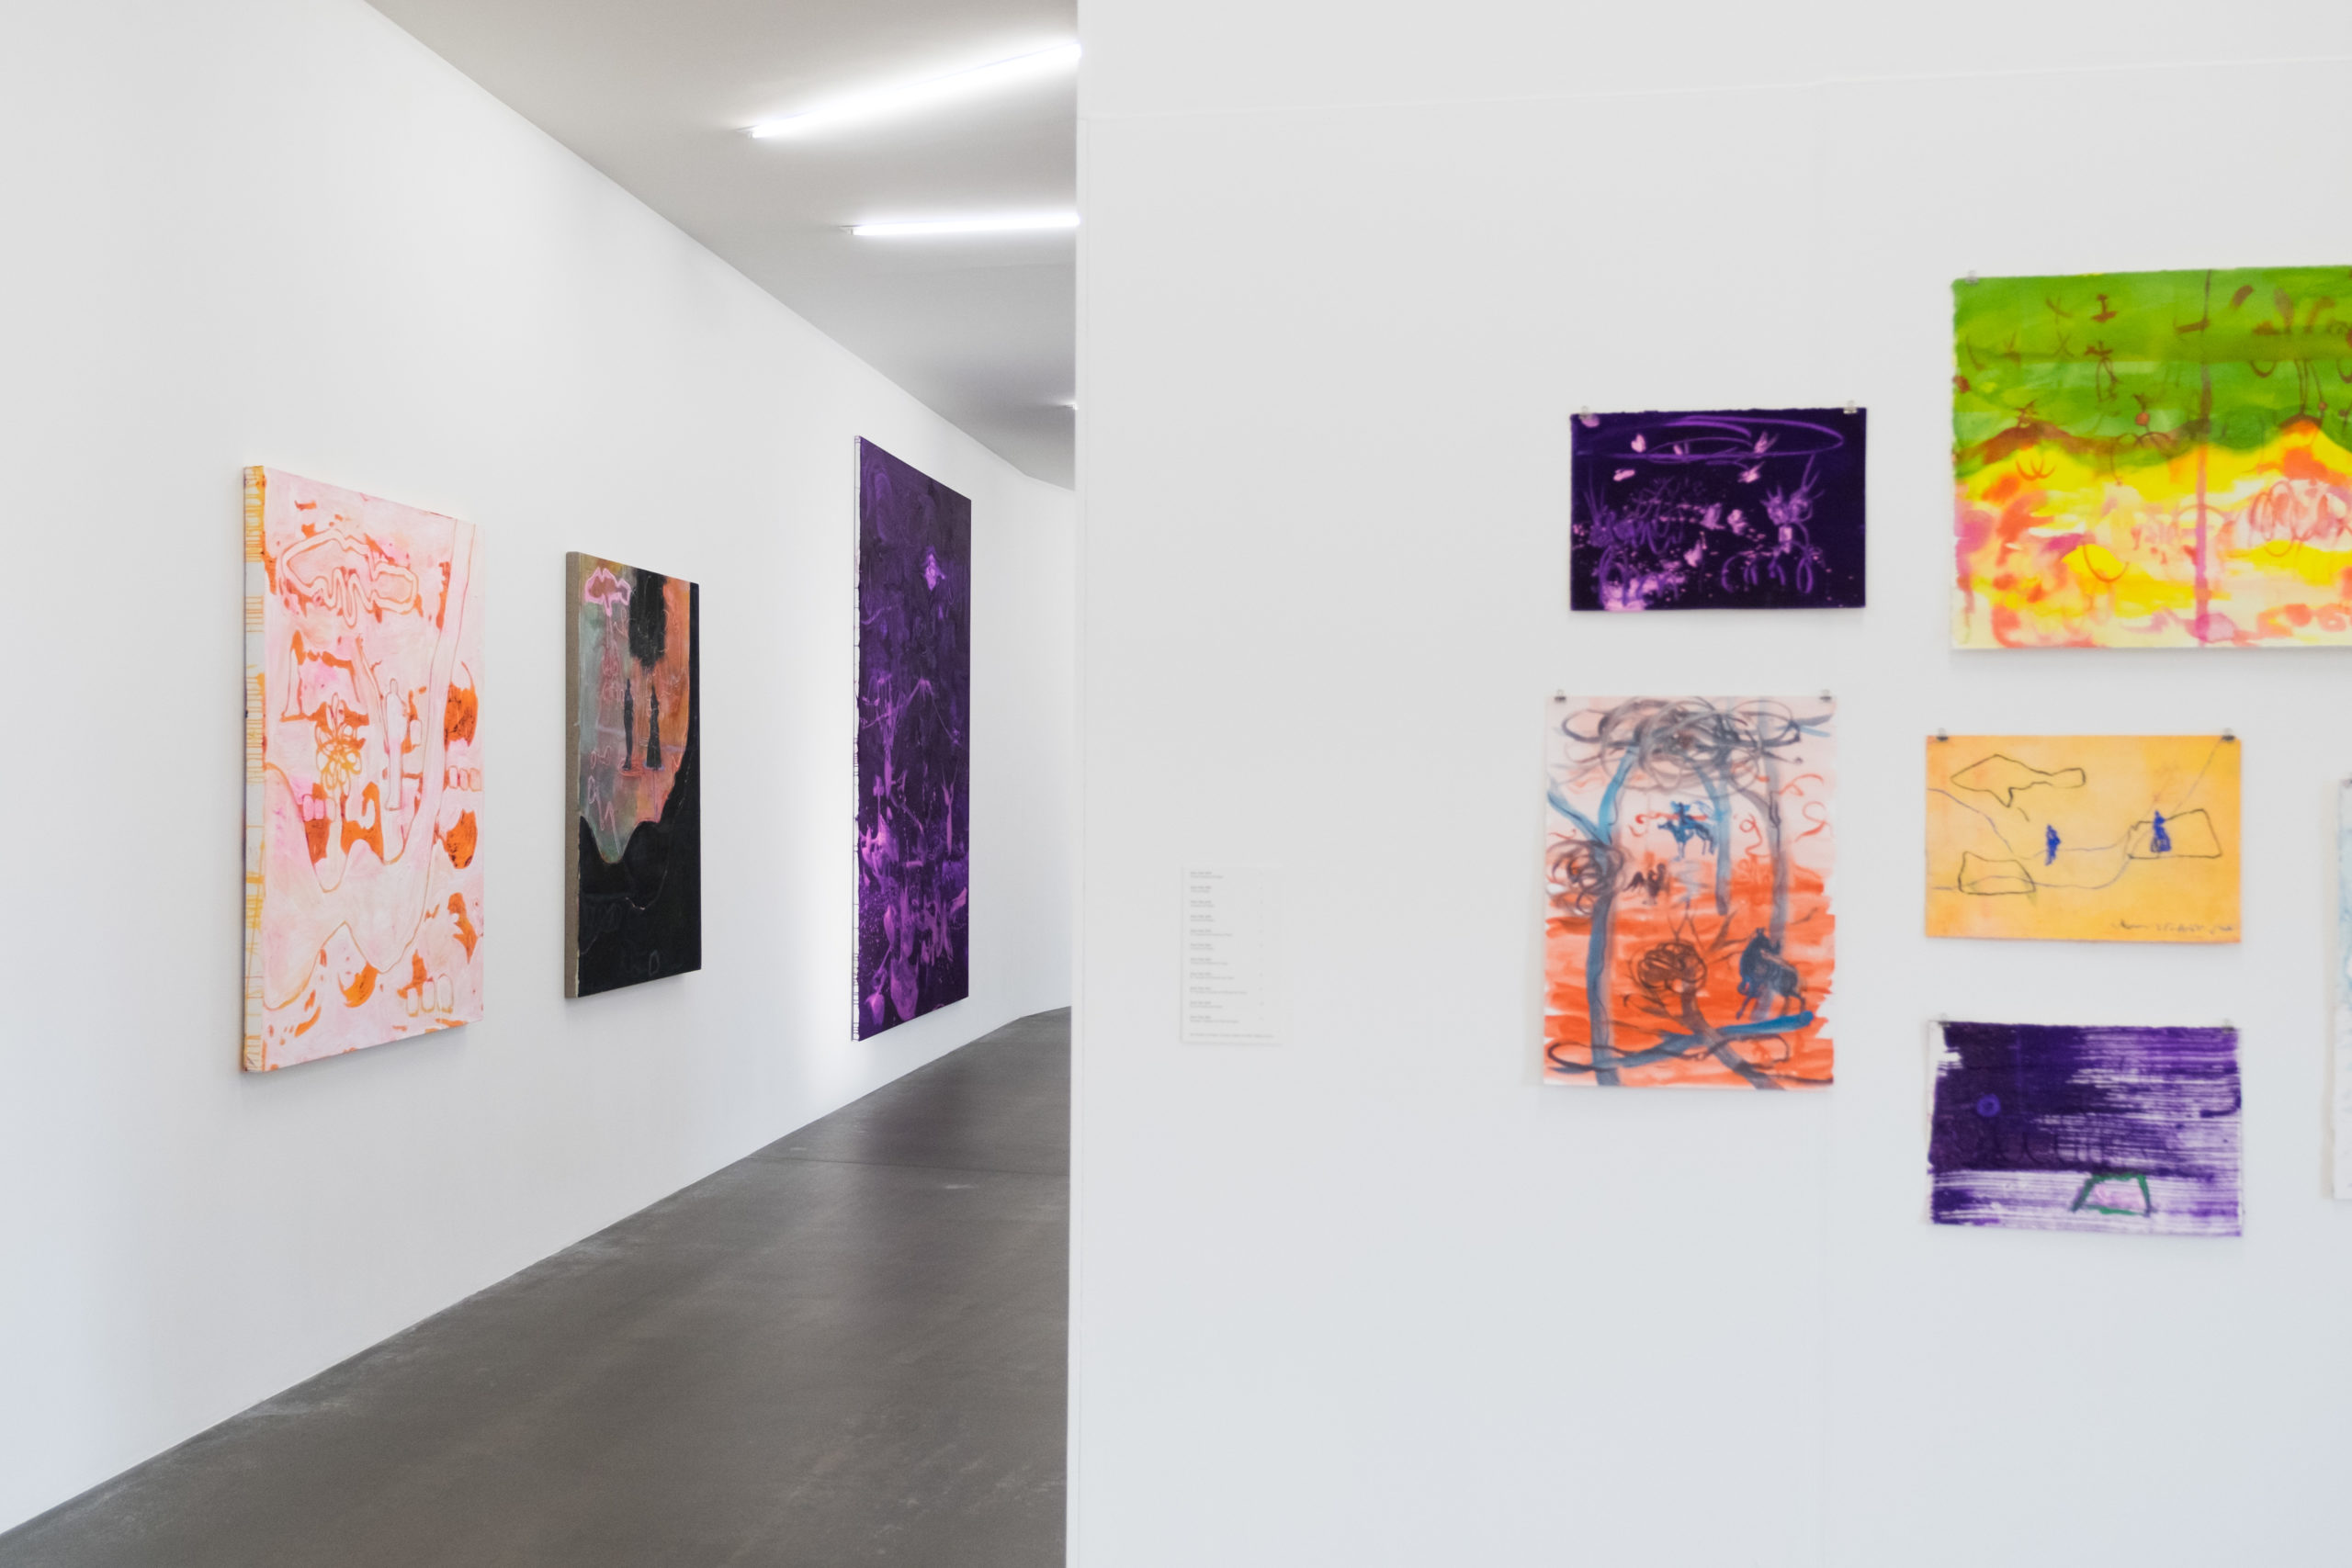 Ausstellungsansicht «Rebekka Steiger – boxing the compass», 22. März - 24. Mai 2020, Kunsthaus Grenchen, Foto: Laura Hadorn © Rebekka Steiger und Galerie Urs Meile, Beijing-Luzern